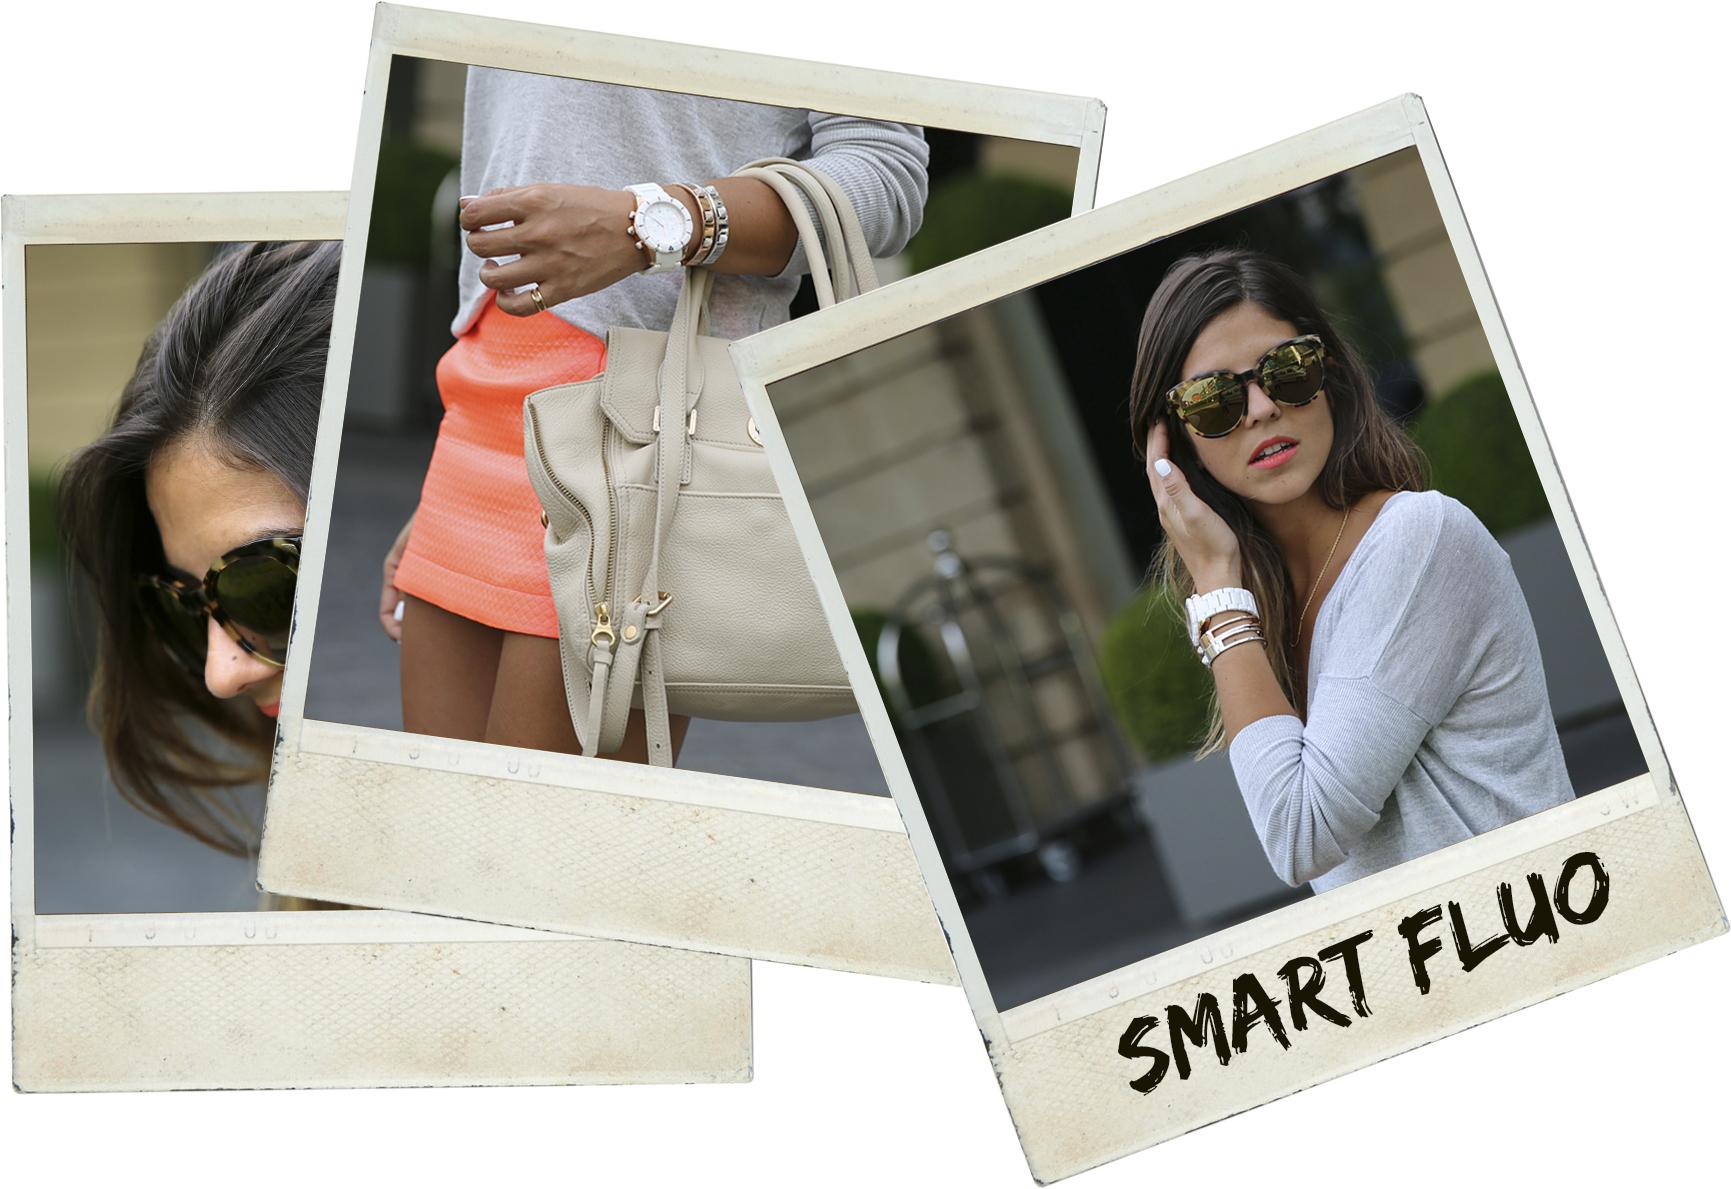 trendy_taste-look-outfit-street_style-ootd-blog-blogger-fashion_spain-moda_españa-primavera-orange-fluo-naranja_fluor_falda-sandalias_plata-silver_sandals-asos-basic_sweater-nine_west-polaroid